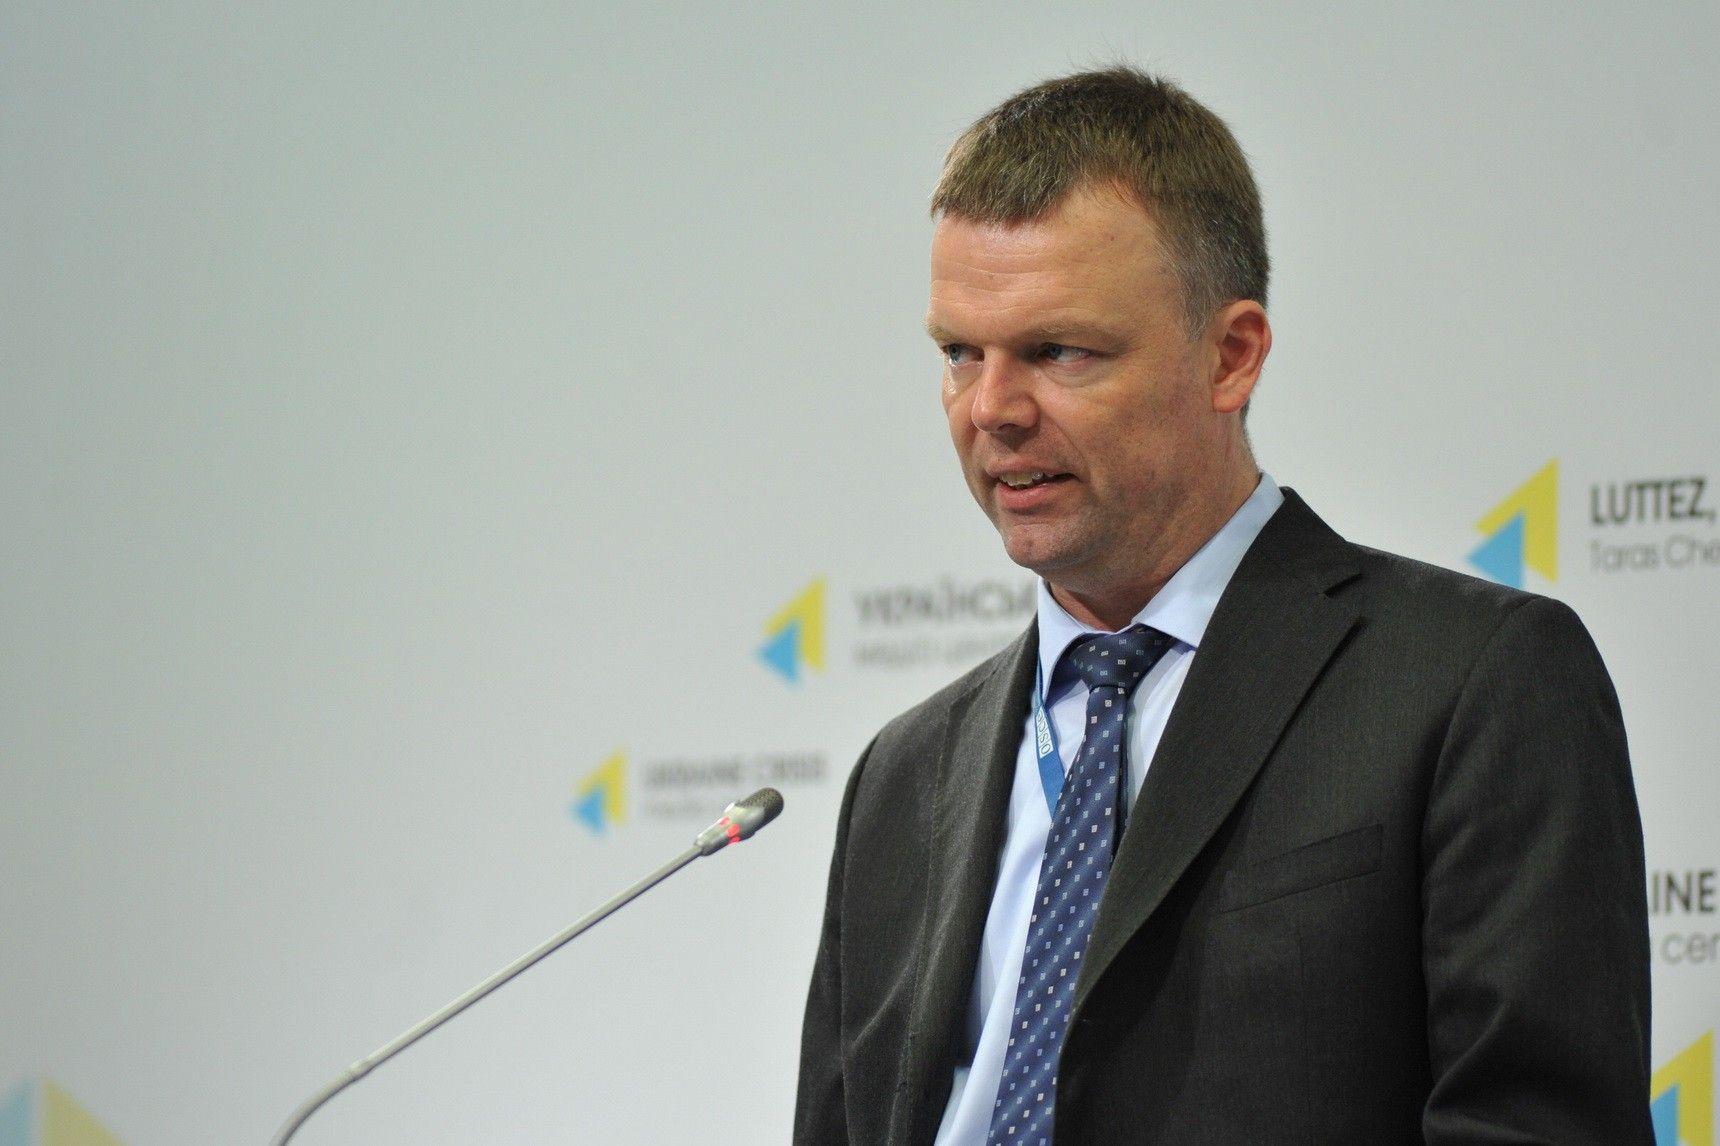 Хуг описал текущую ситуацию на Донбассе как